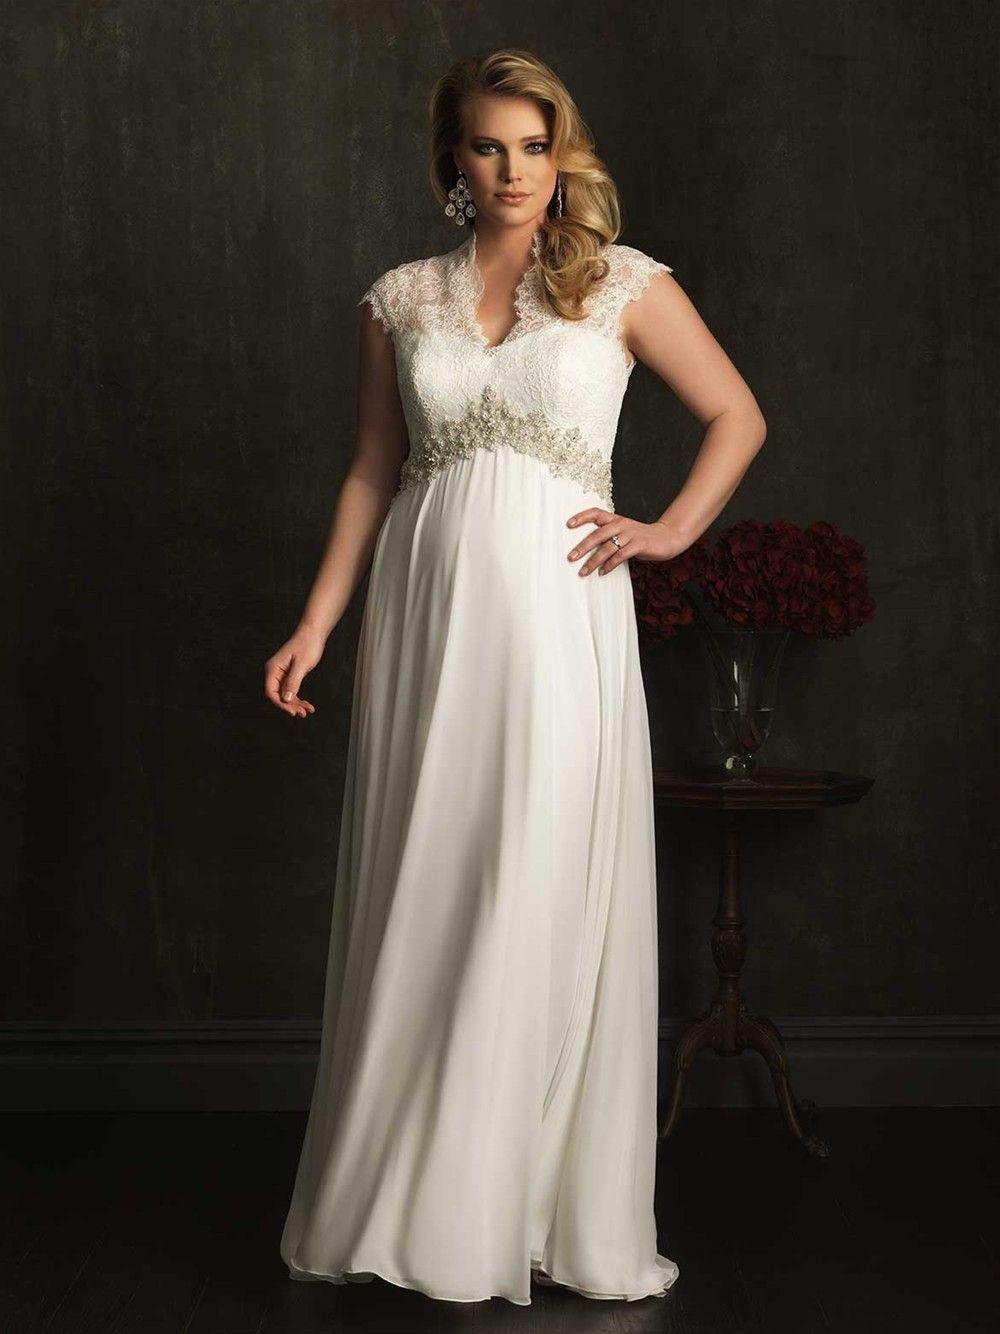 Plus size dresses v neck for weddings short sleeves lace wedding